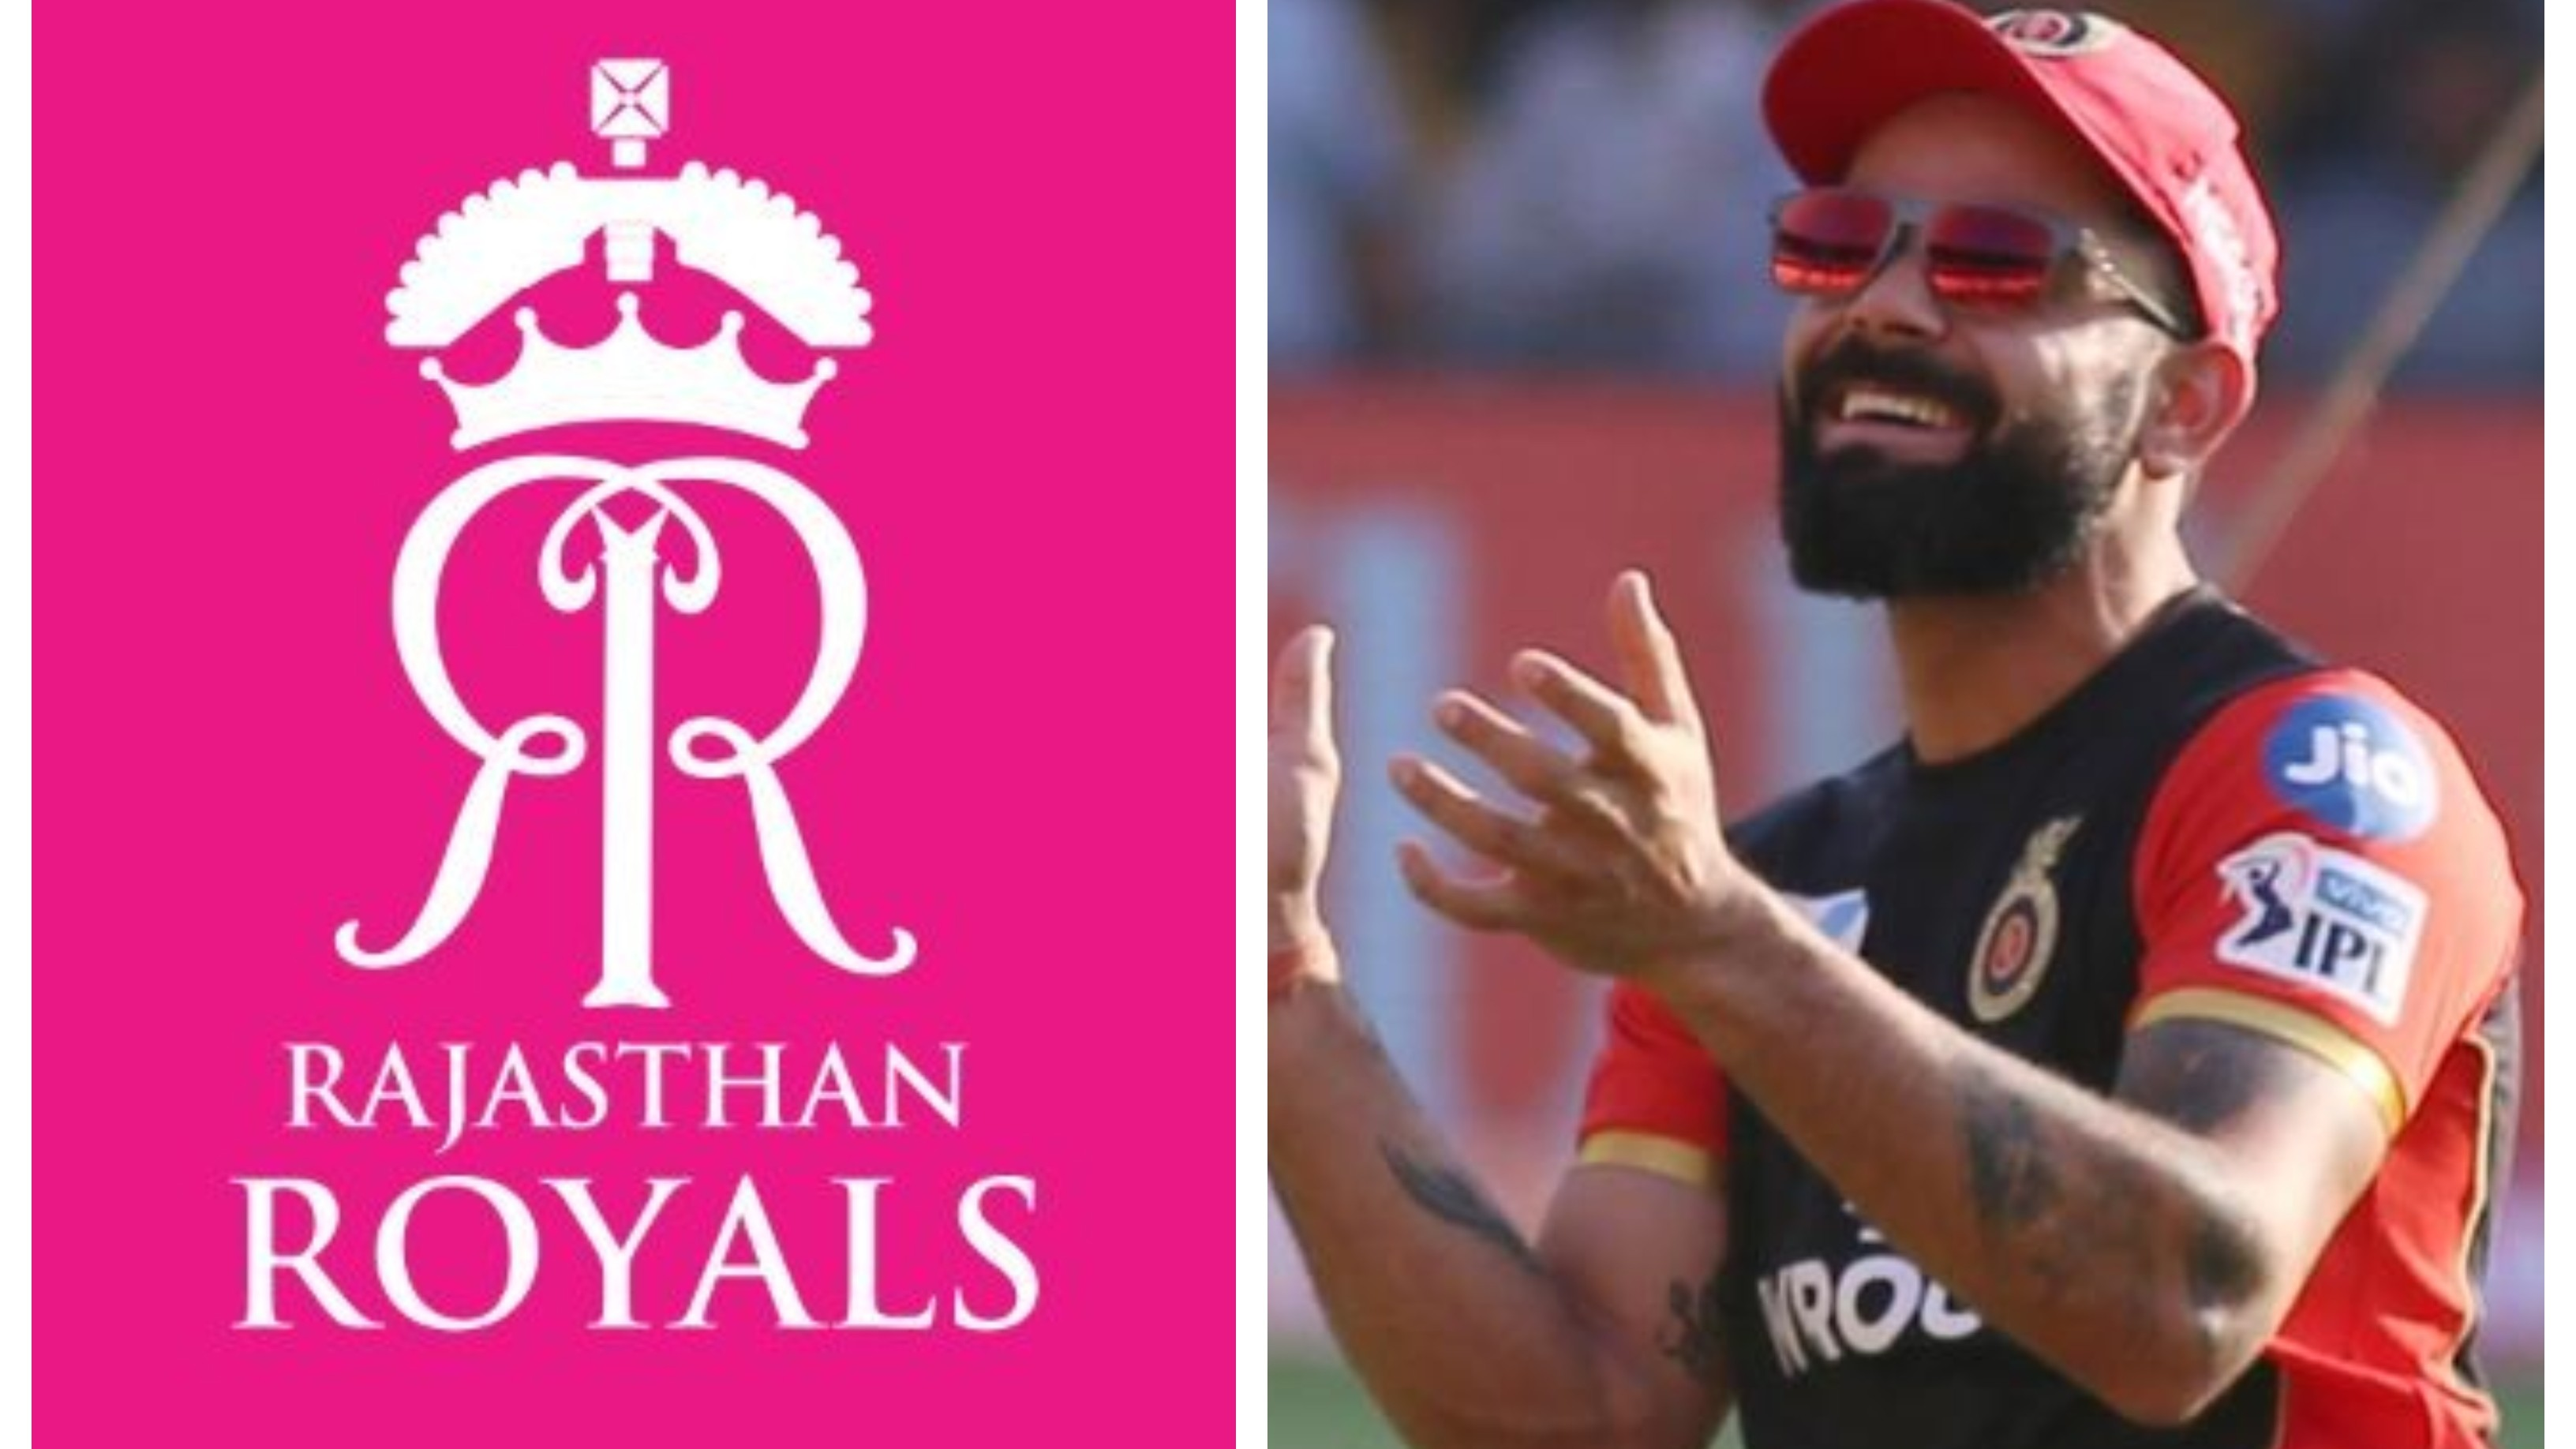 IPL 2020: Rajasthan Royals react after a fan suggests the franchise to sign Virat Kohli